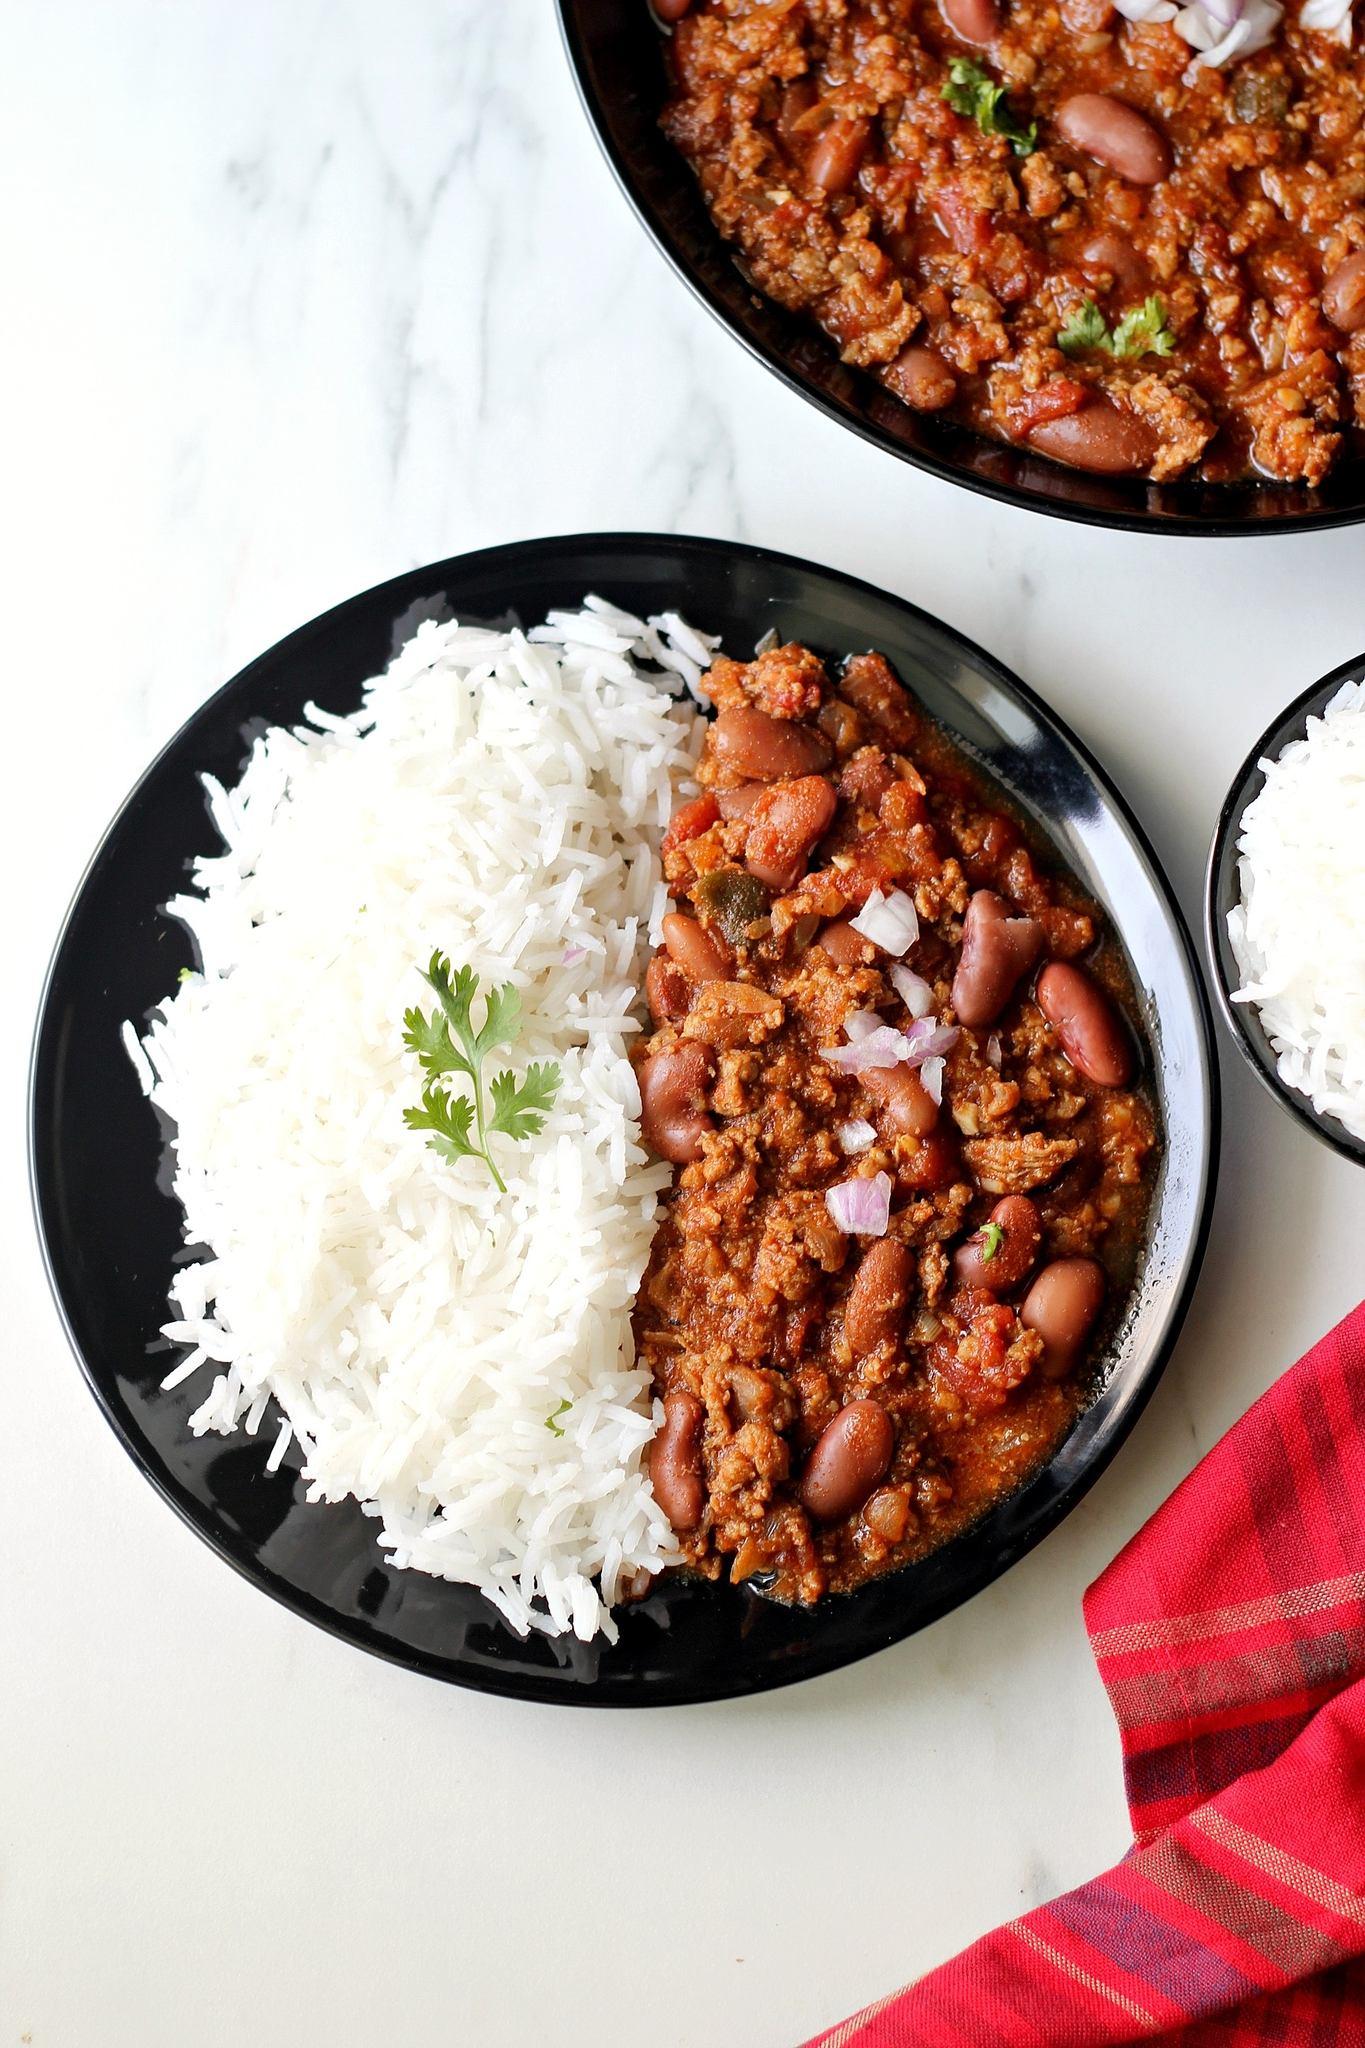 Chili Con Carne - Ruchik Randhap